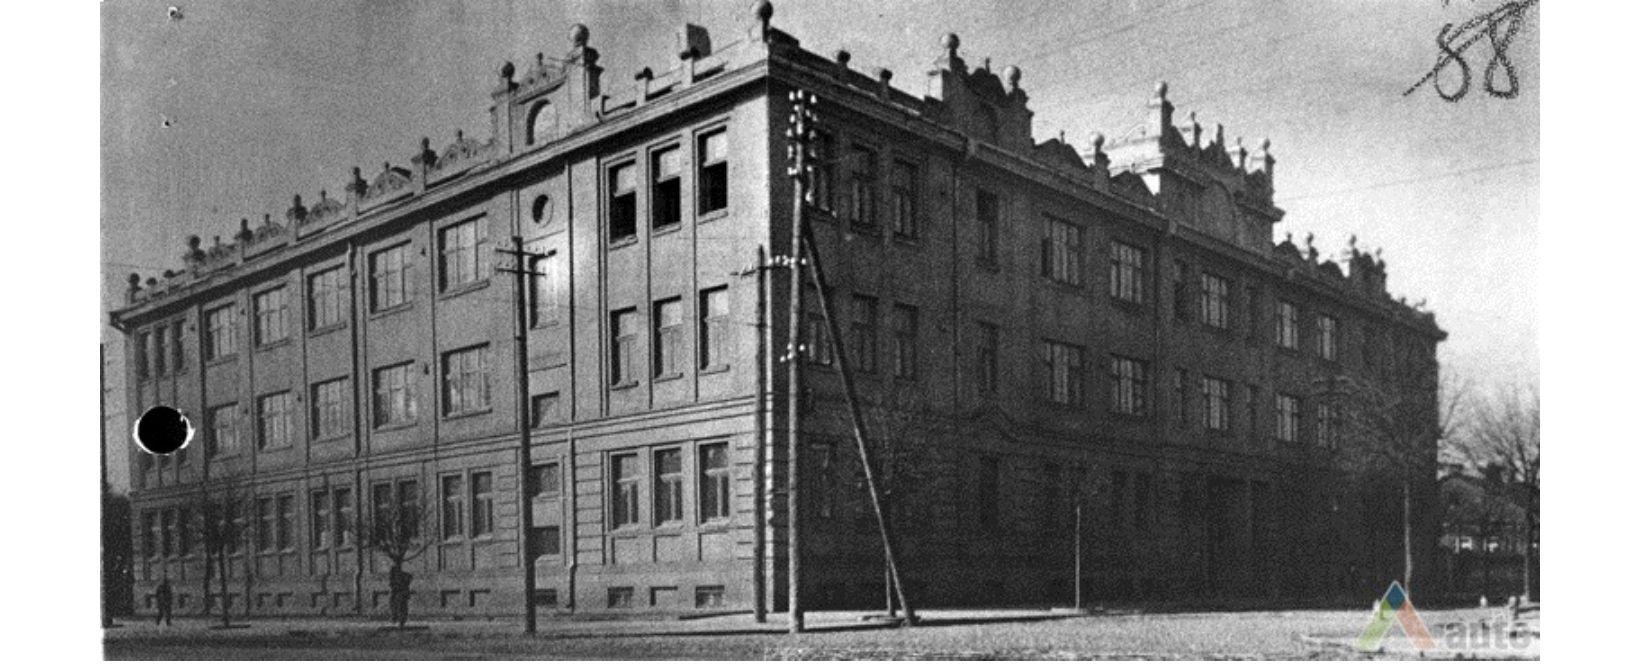 lenku gimnazija istorine